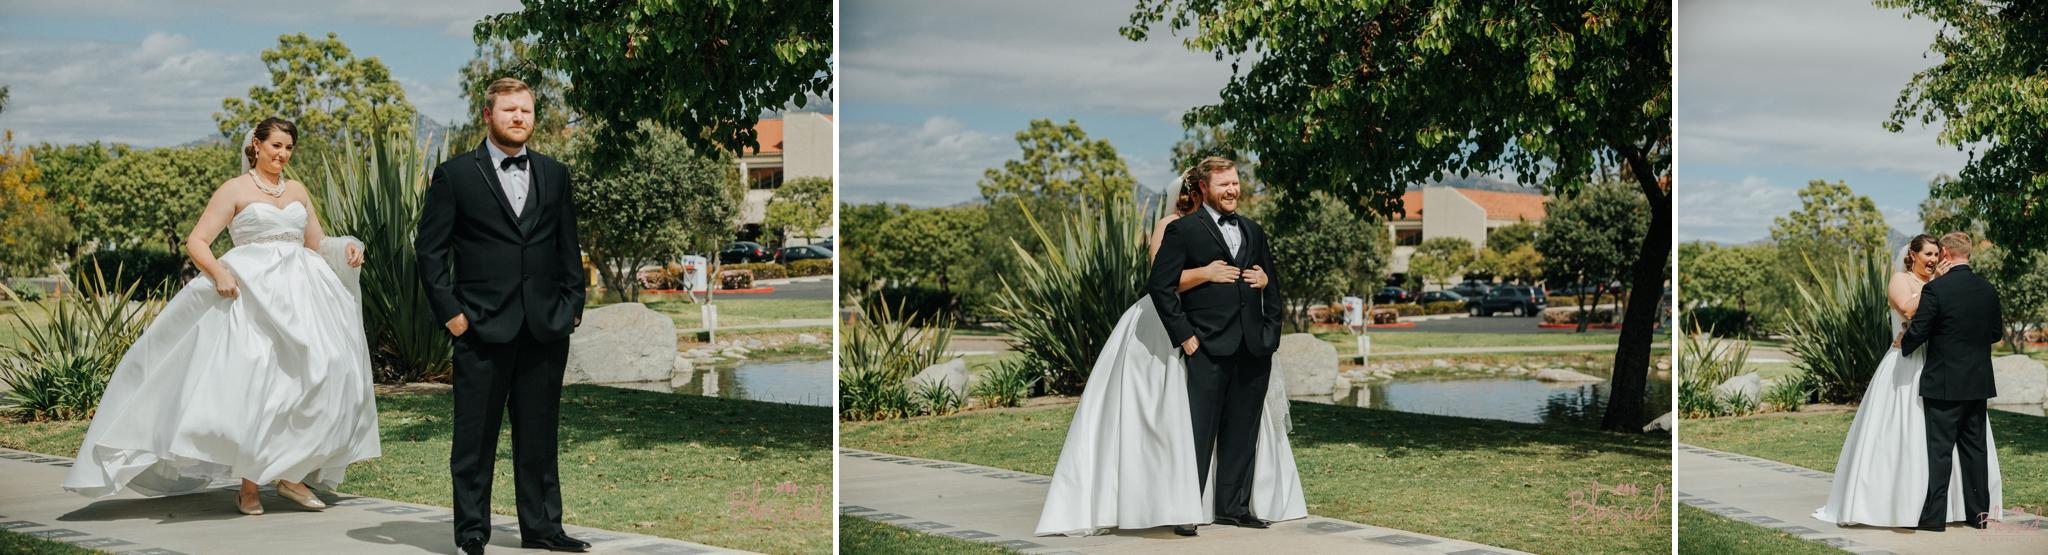 Orfila Vinery Wedding by Blessed Wedding Photography 21.jpg